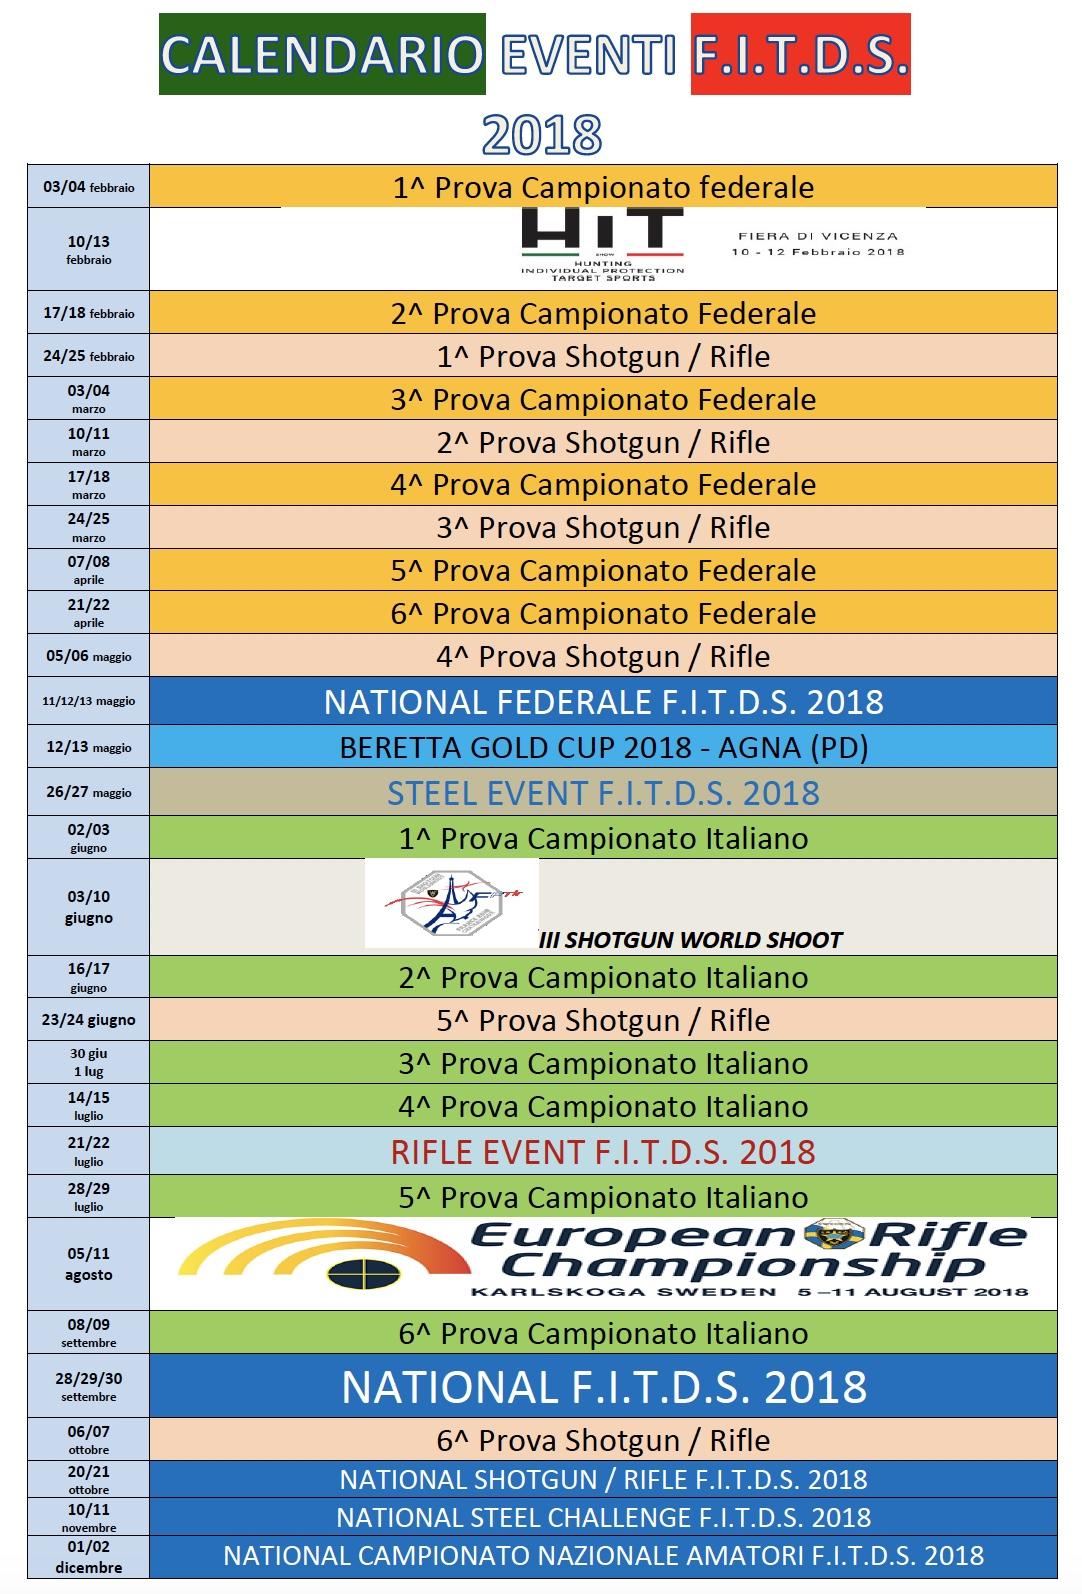 Calendario Nazionali.Calendario Eventi Nazionali 2018 F I T D S